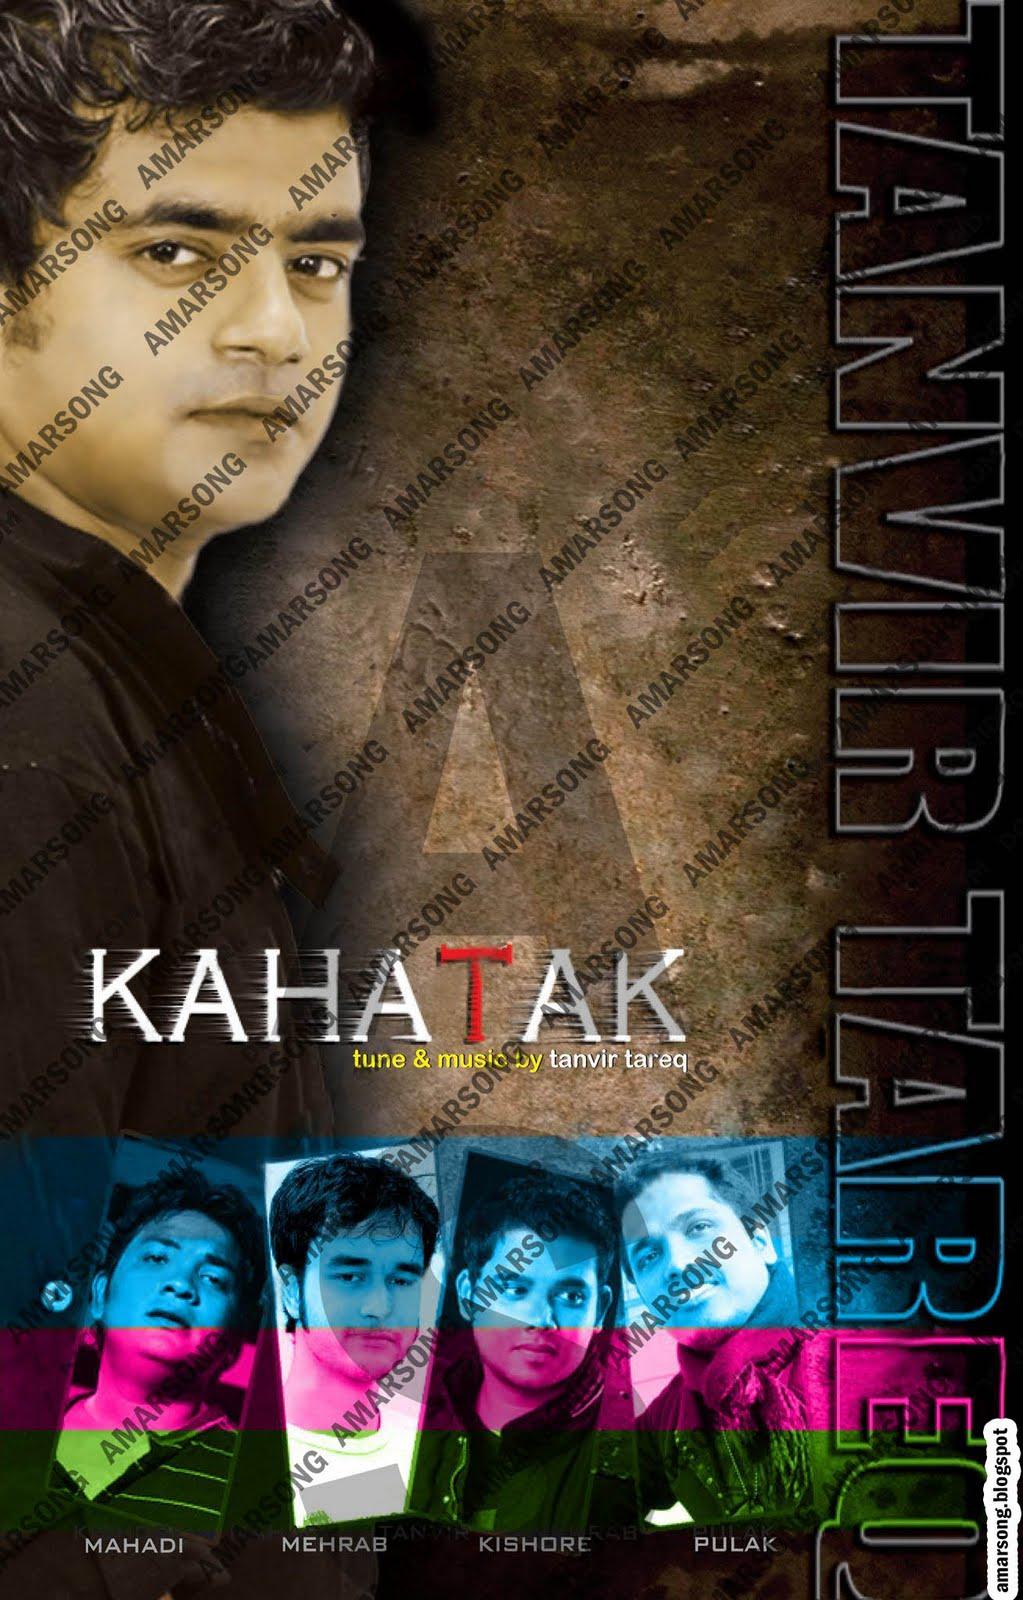 Kahatak - Mix (2011) MP3 Download 128Kbps